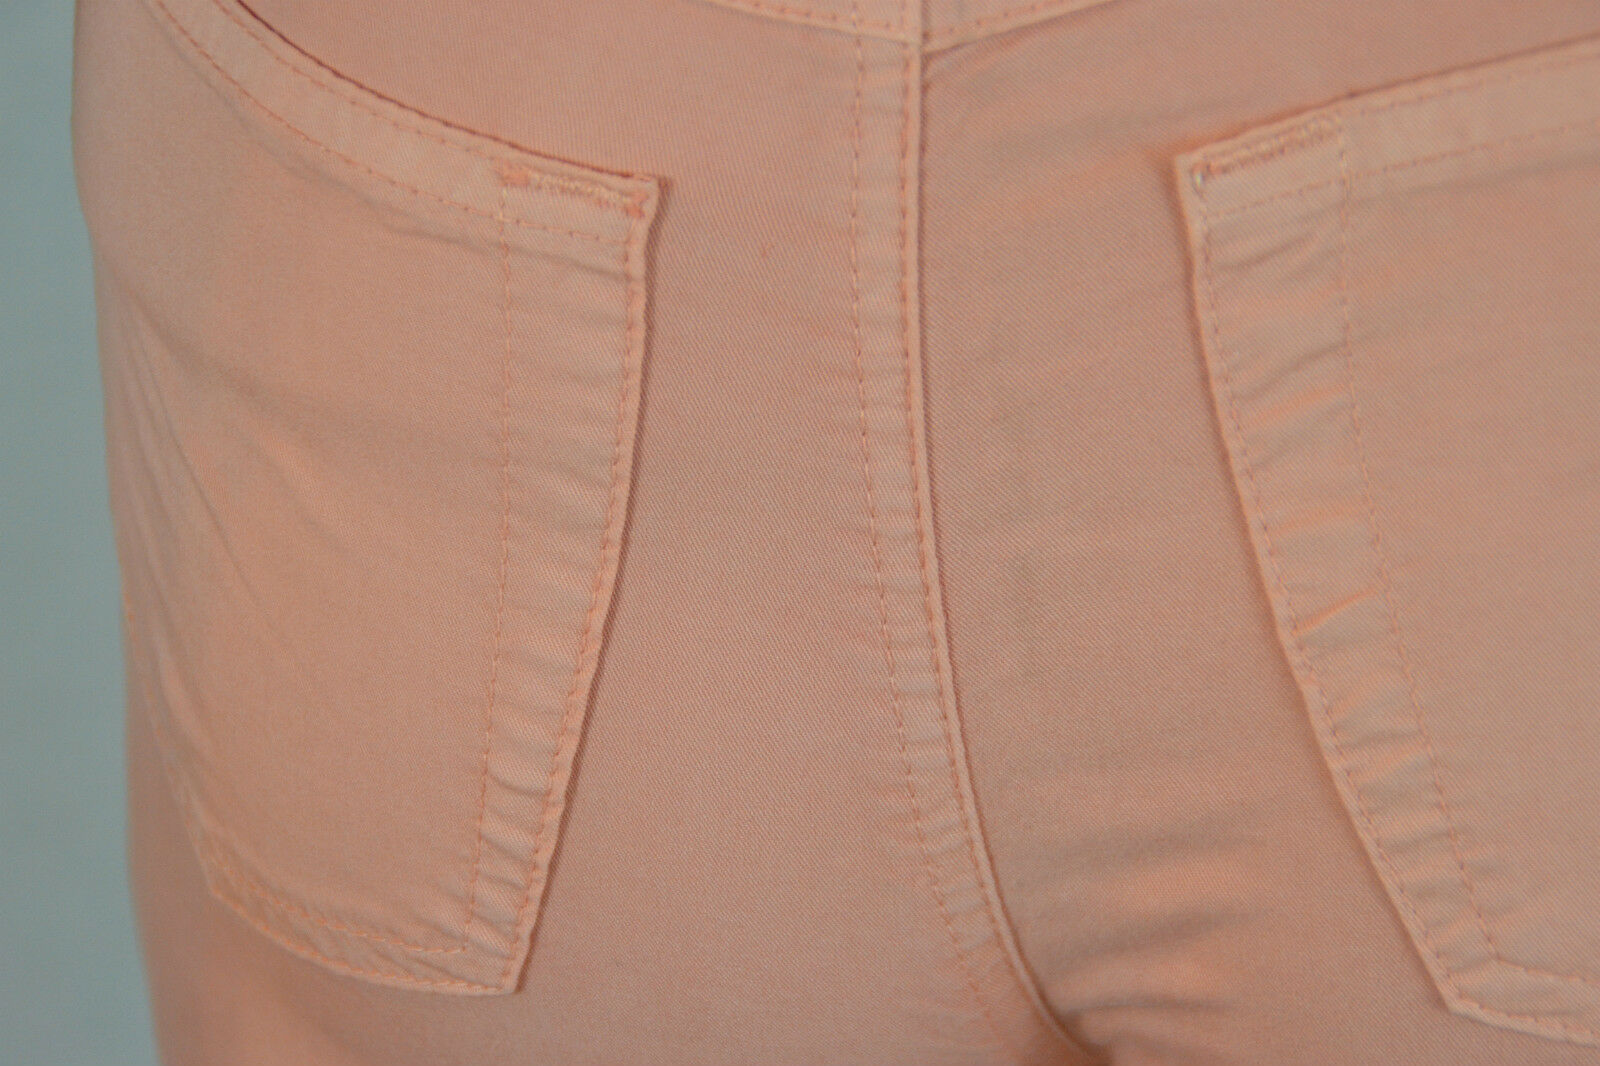 VERSACE Woherren New Rosa Casual Cotton High Waist Vtg Vtg Vtg Trousers Pants sz 28 AT28 a9a003